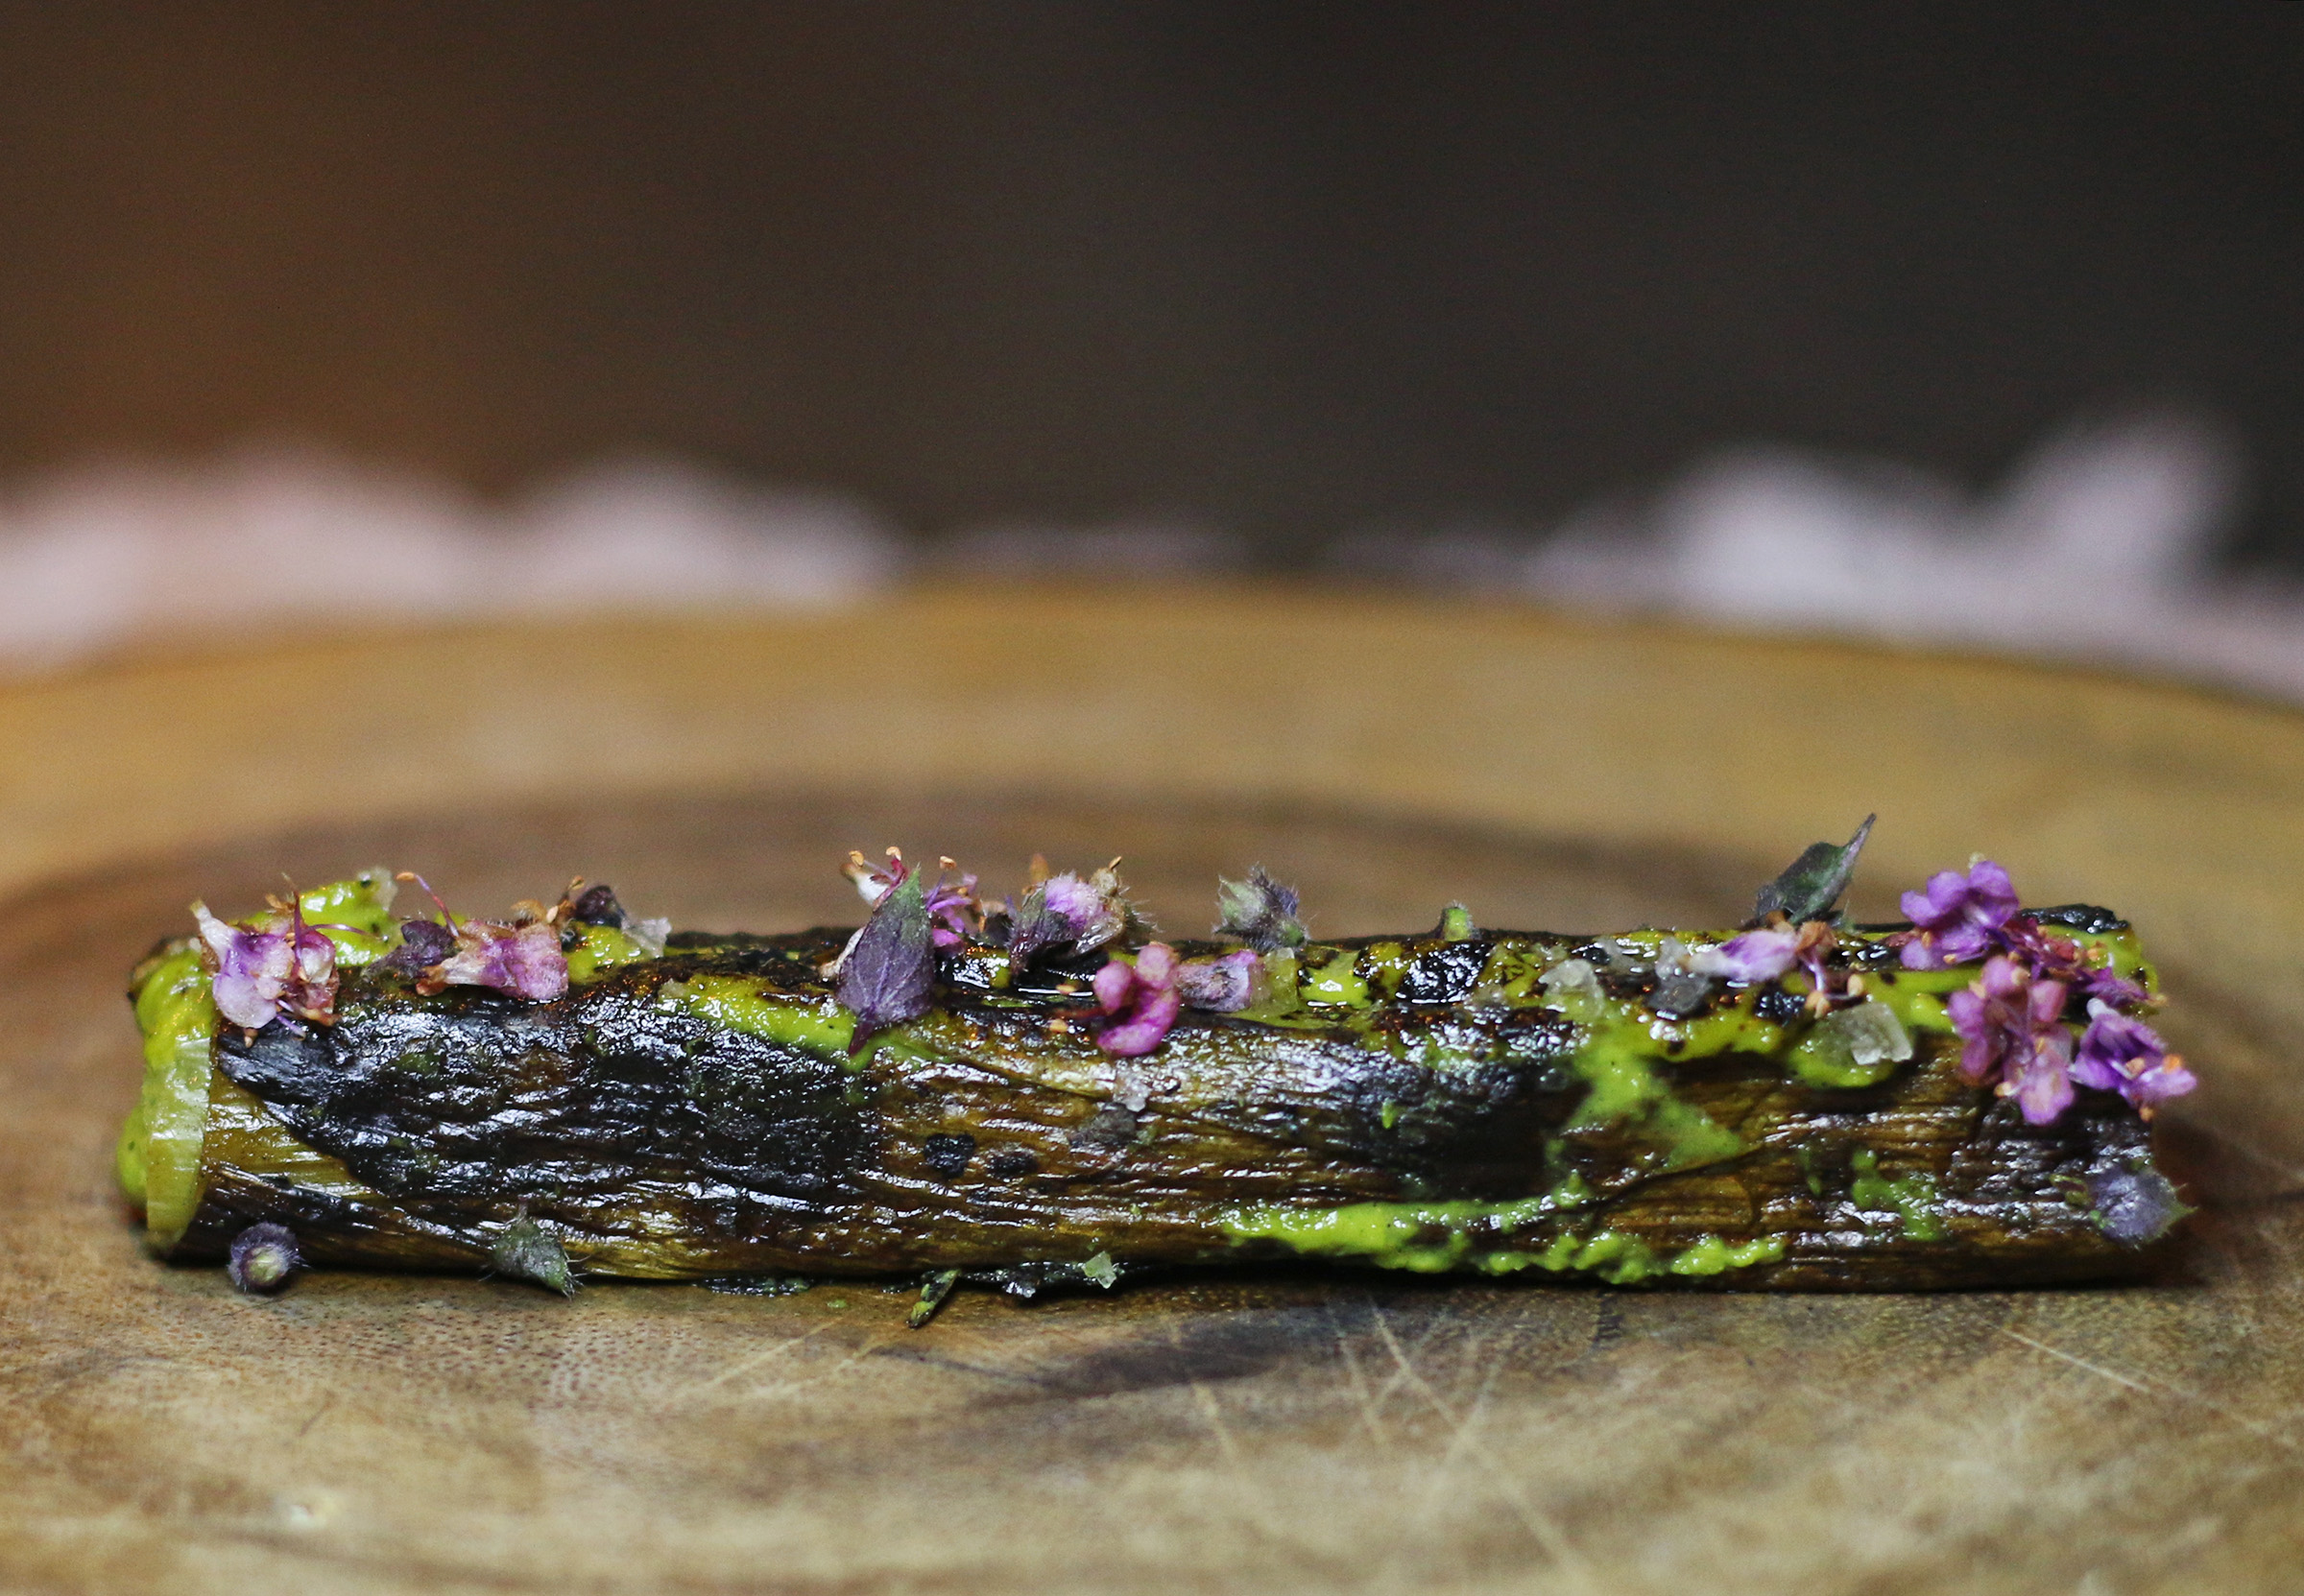 Roasted Leek with French Sea Salt and Bone Marrow